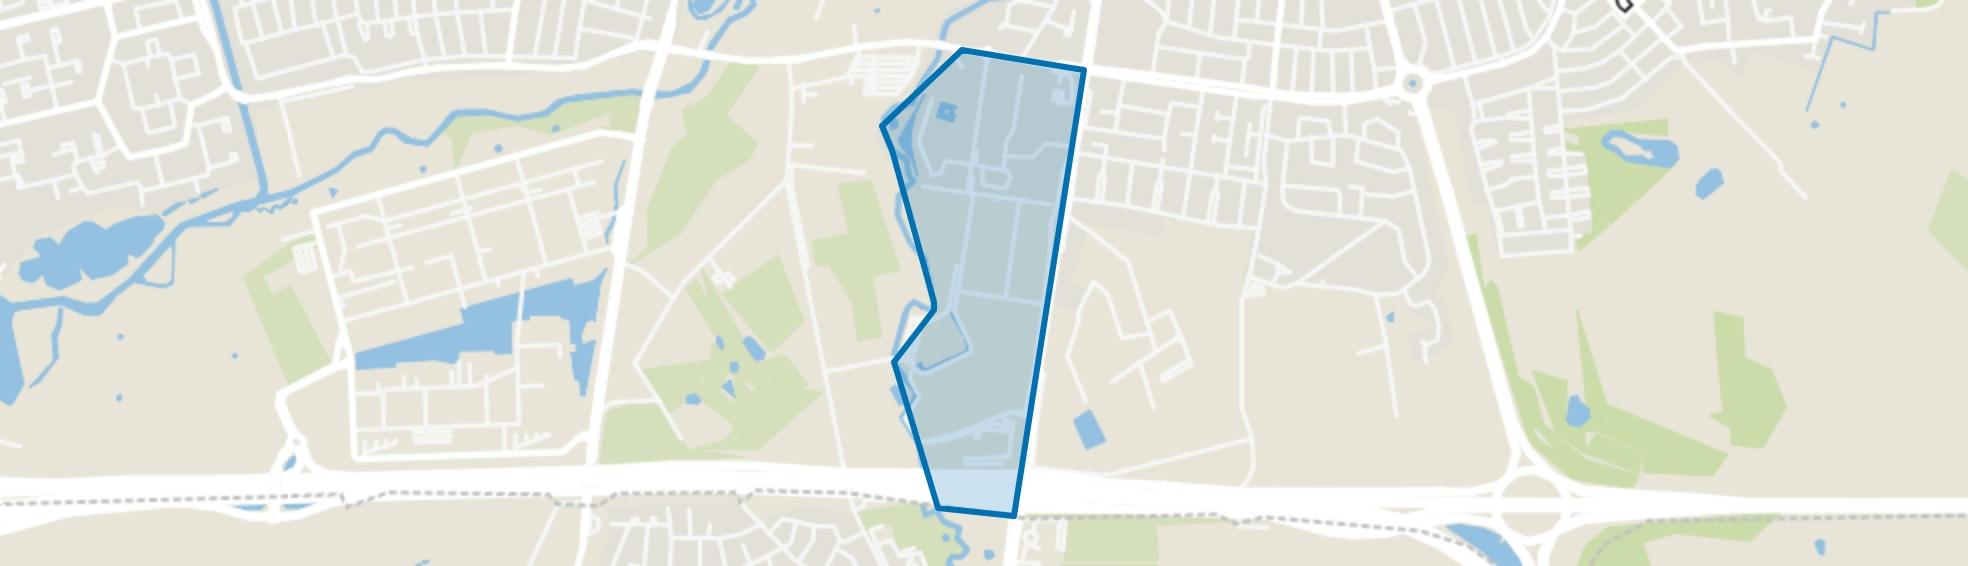 Sportpark Aalsterweg, Eindhoven map